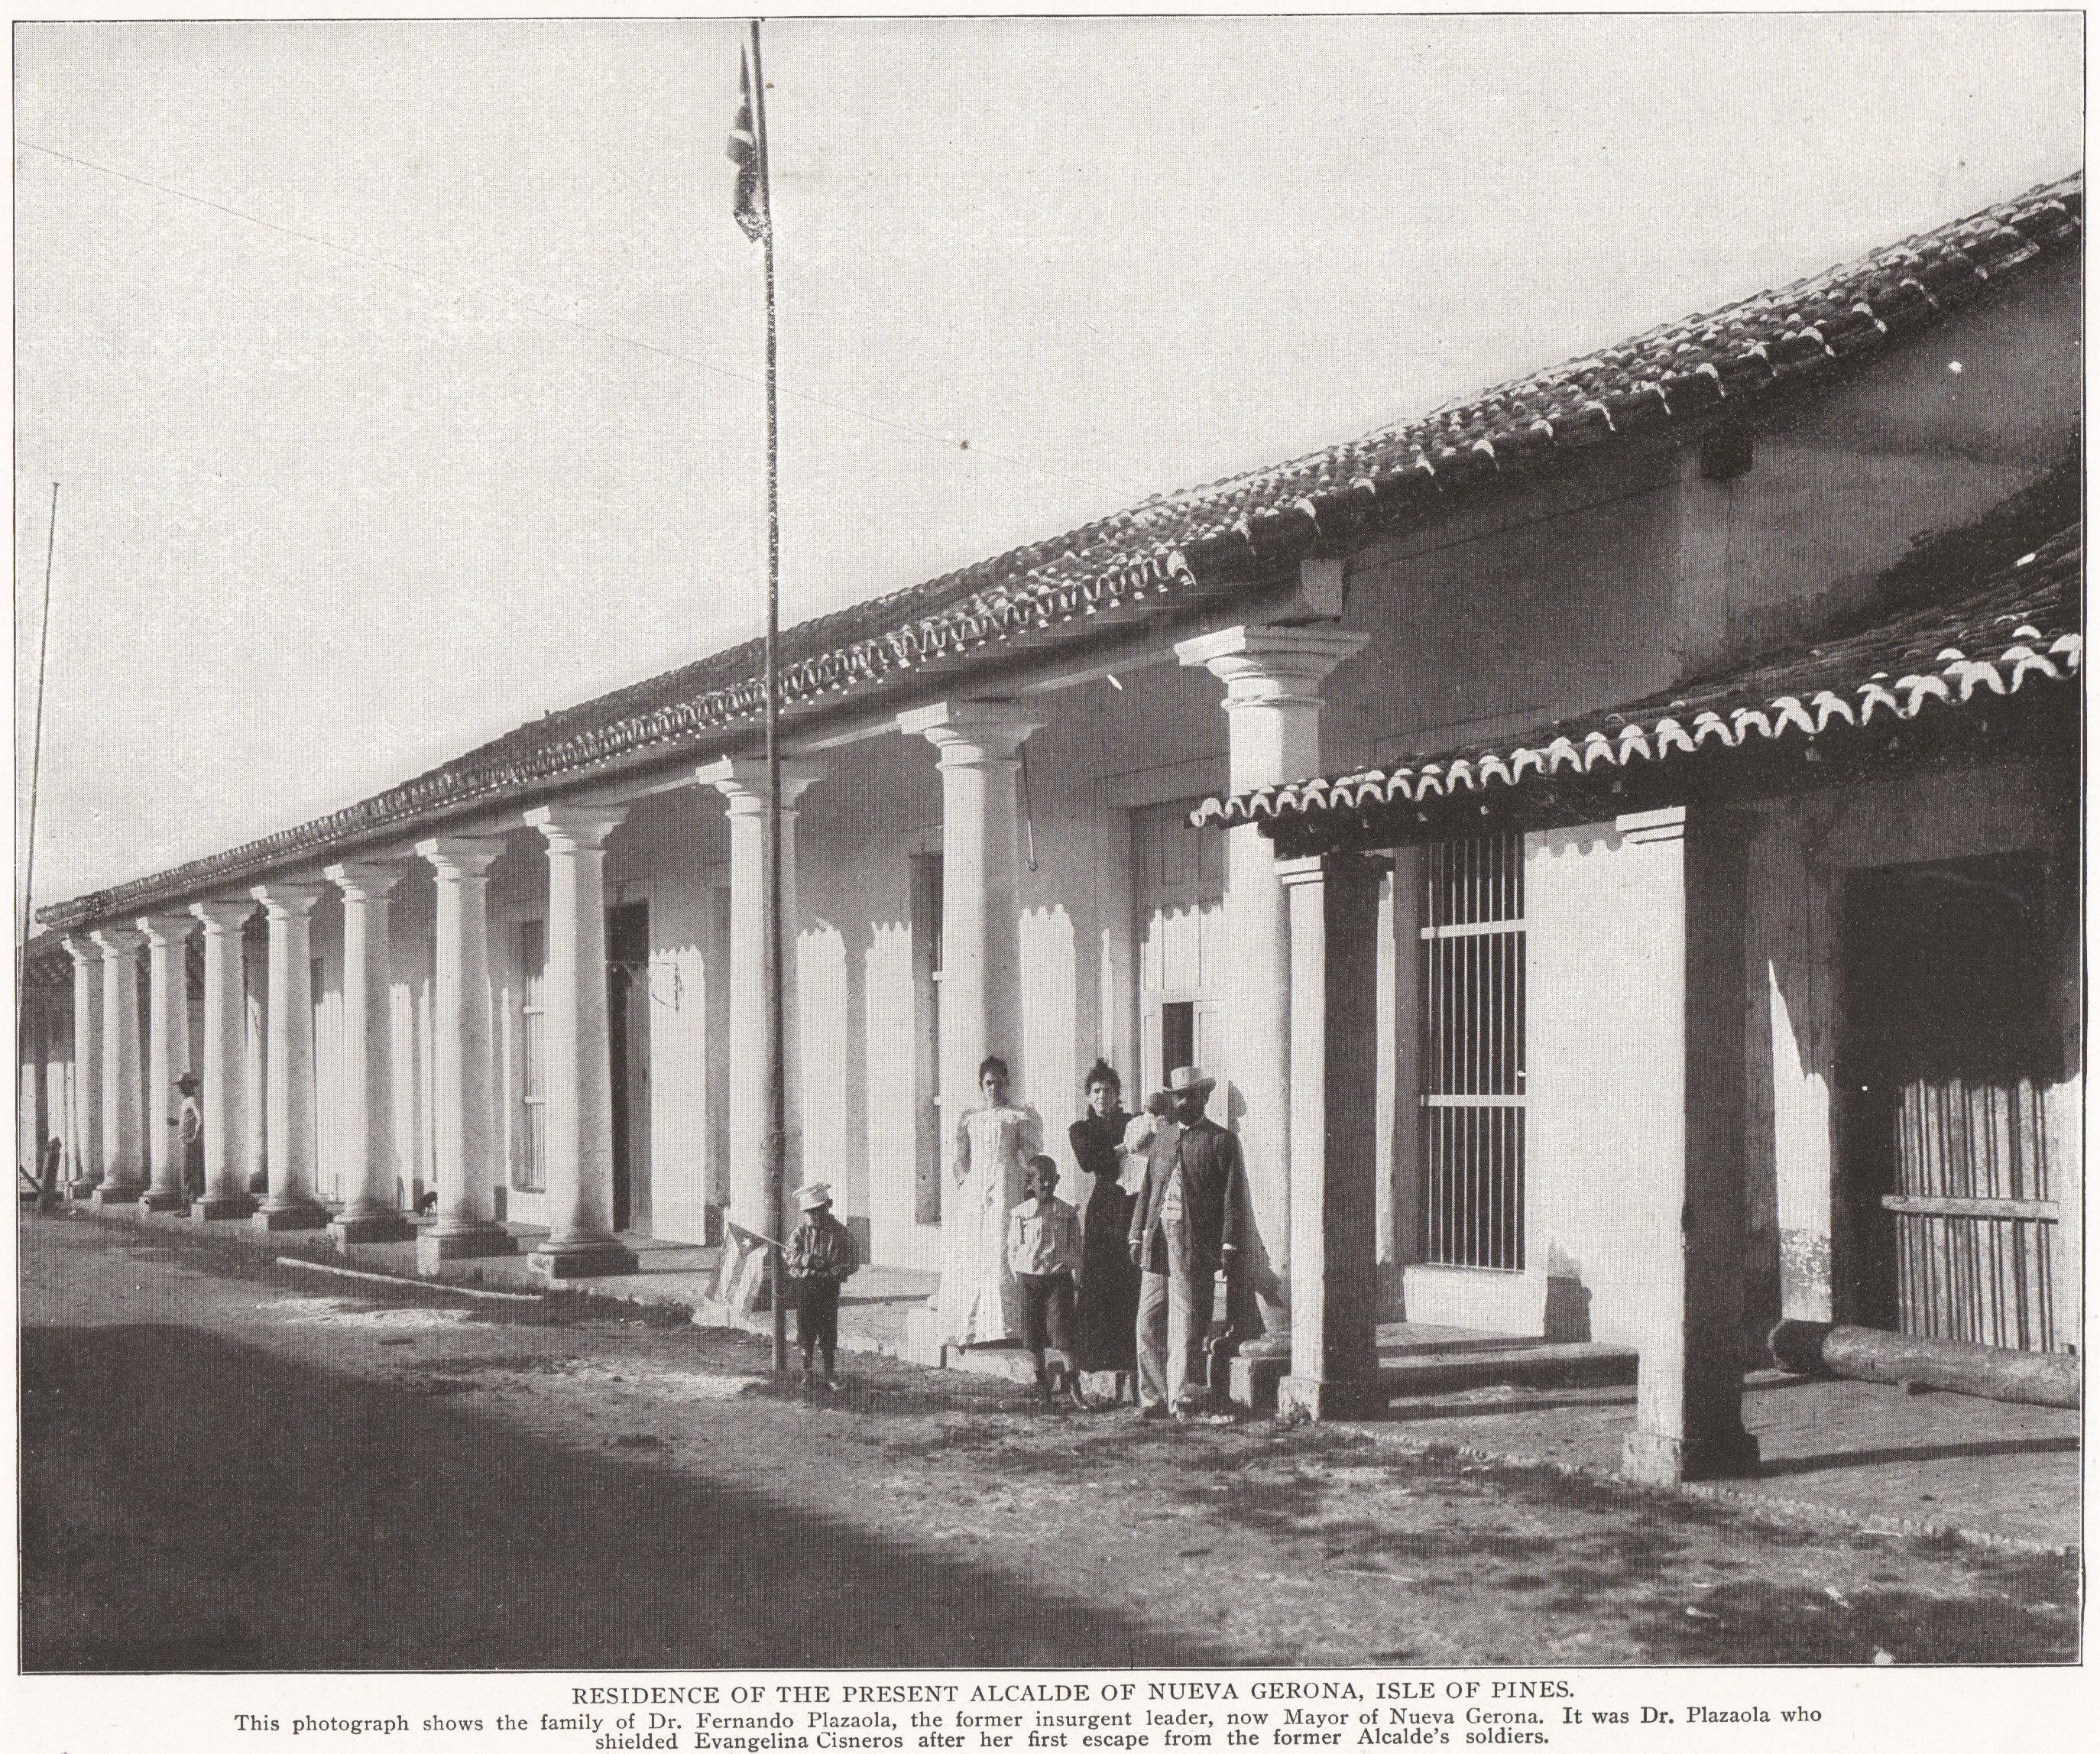 Residence of the Alcalde of Nueva Gerona, Cuba